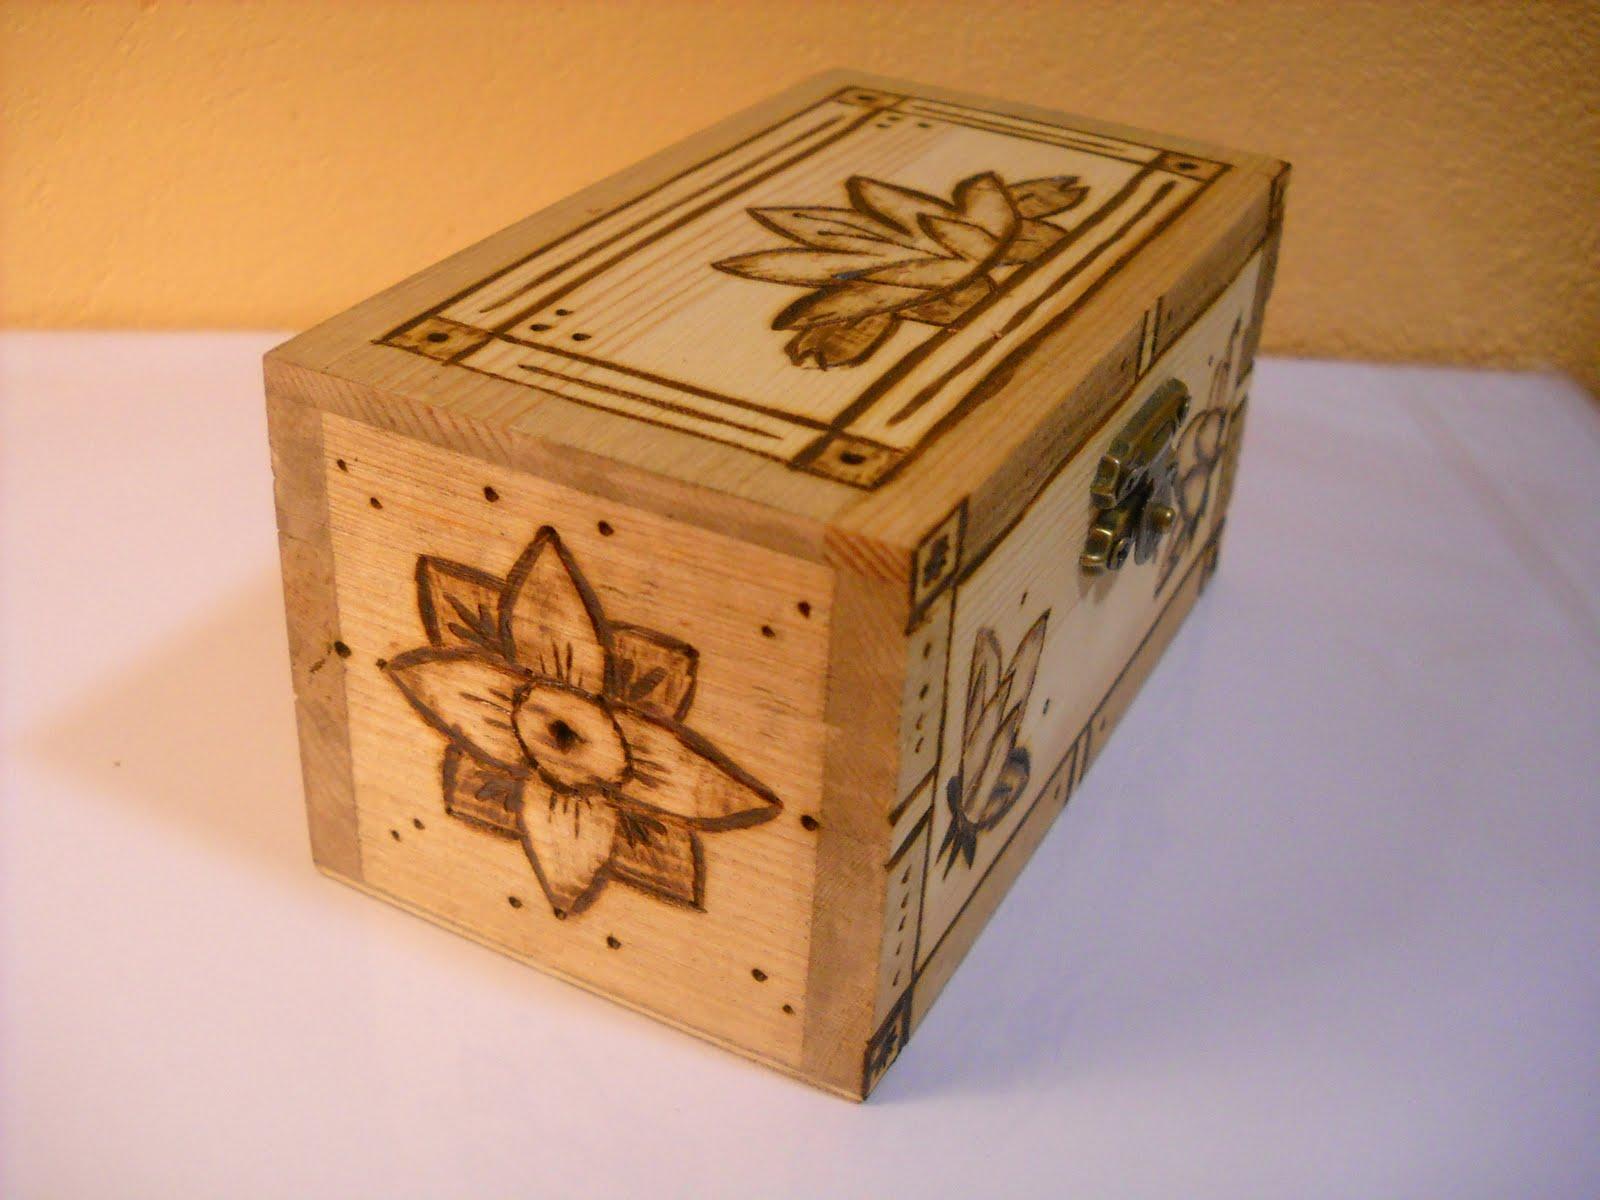 Abalorios a mano tutorial pirograbado 2 - Dibujos para decorar cajas de madera ...